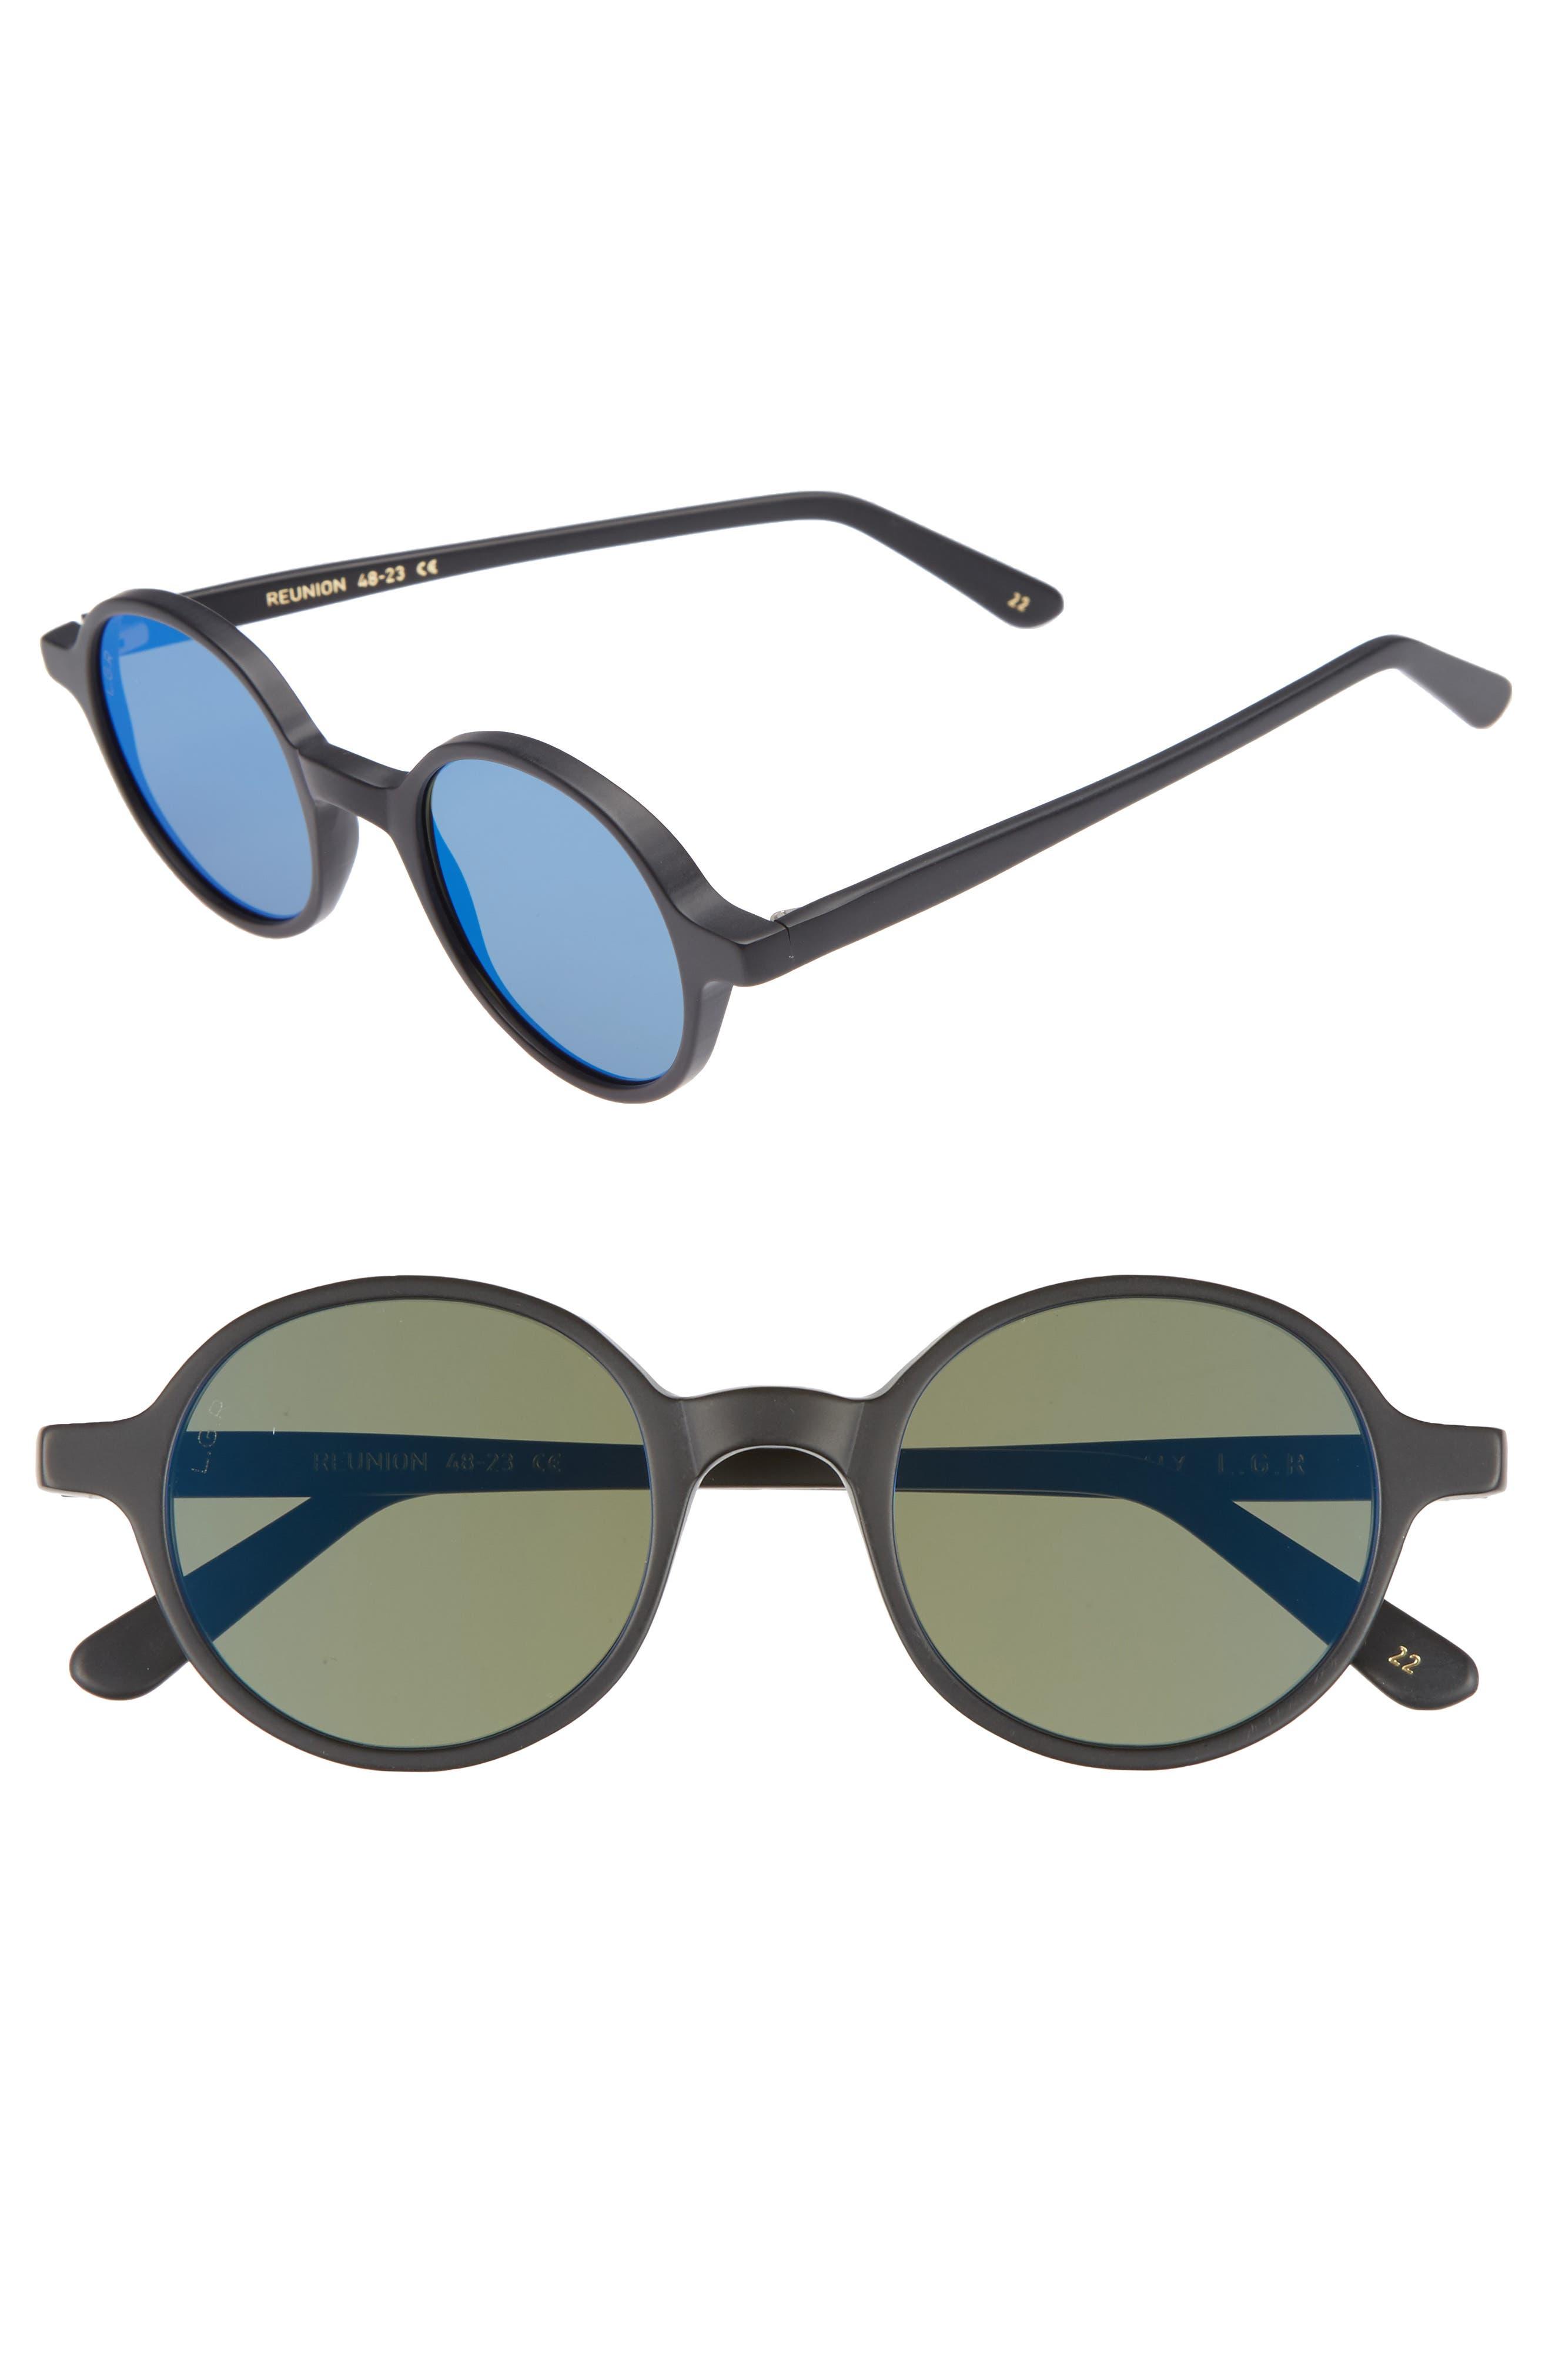 L.G.R. Reunion 48mm Sunglasses